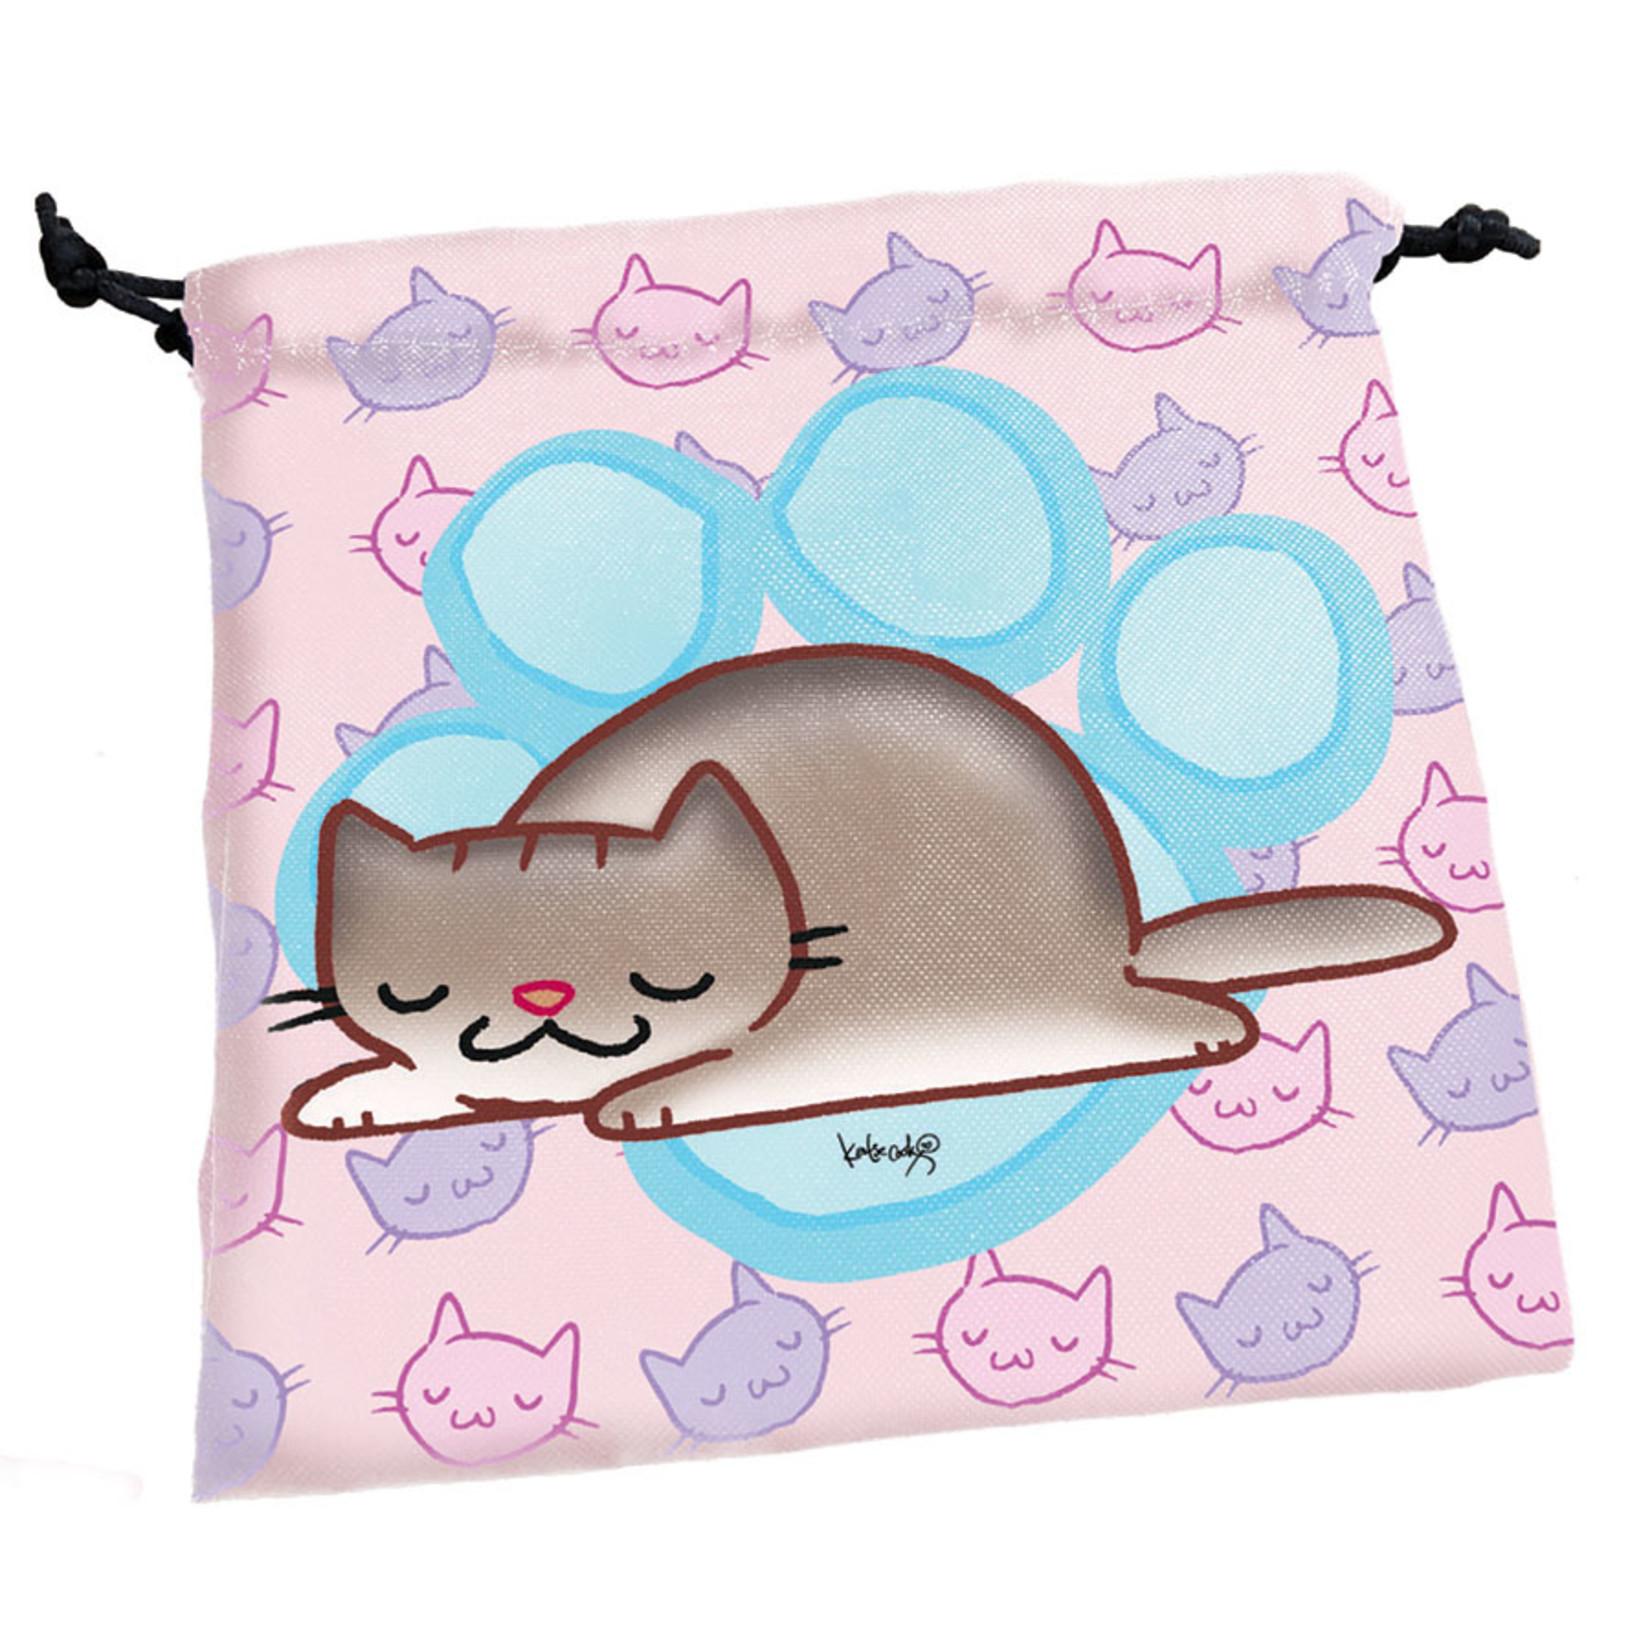 Dice Bag: Munchkin Kittens